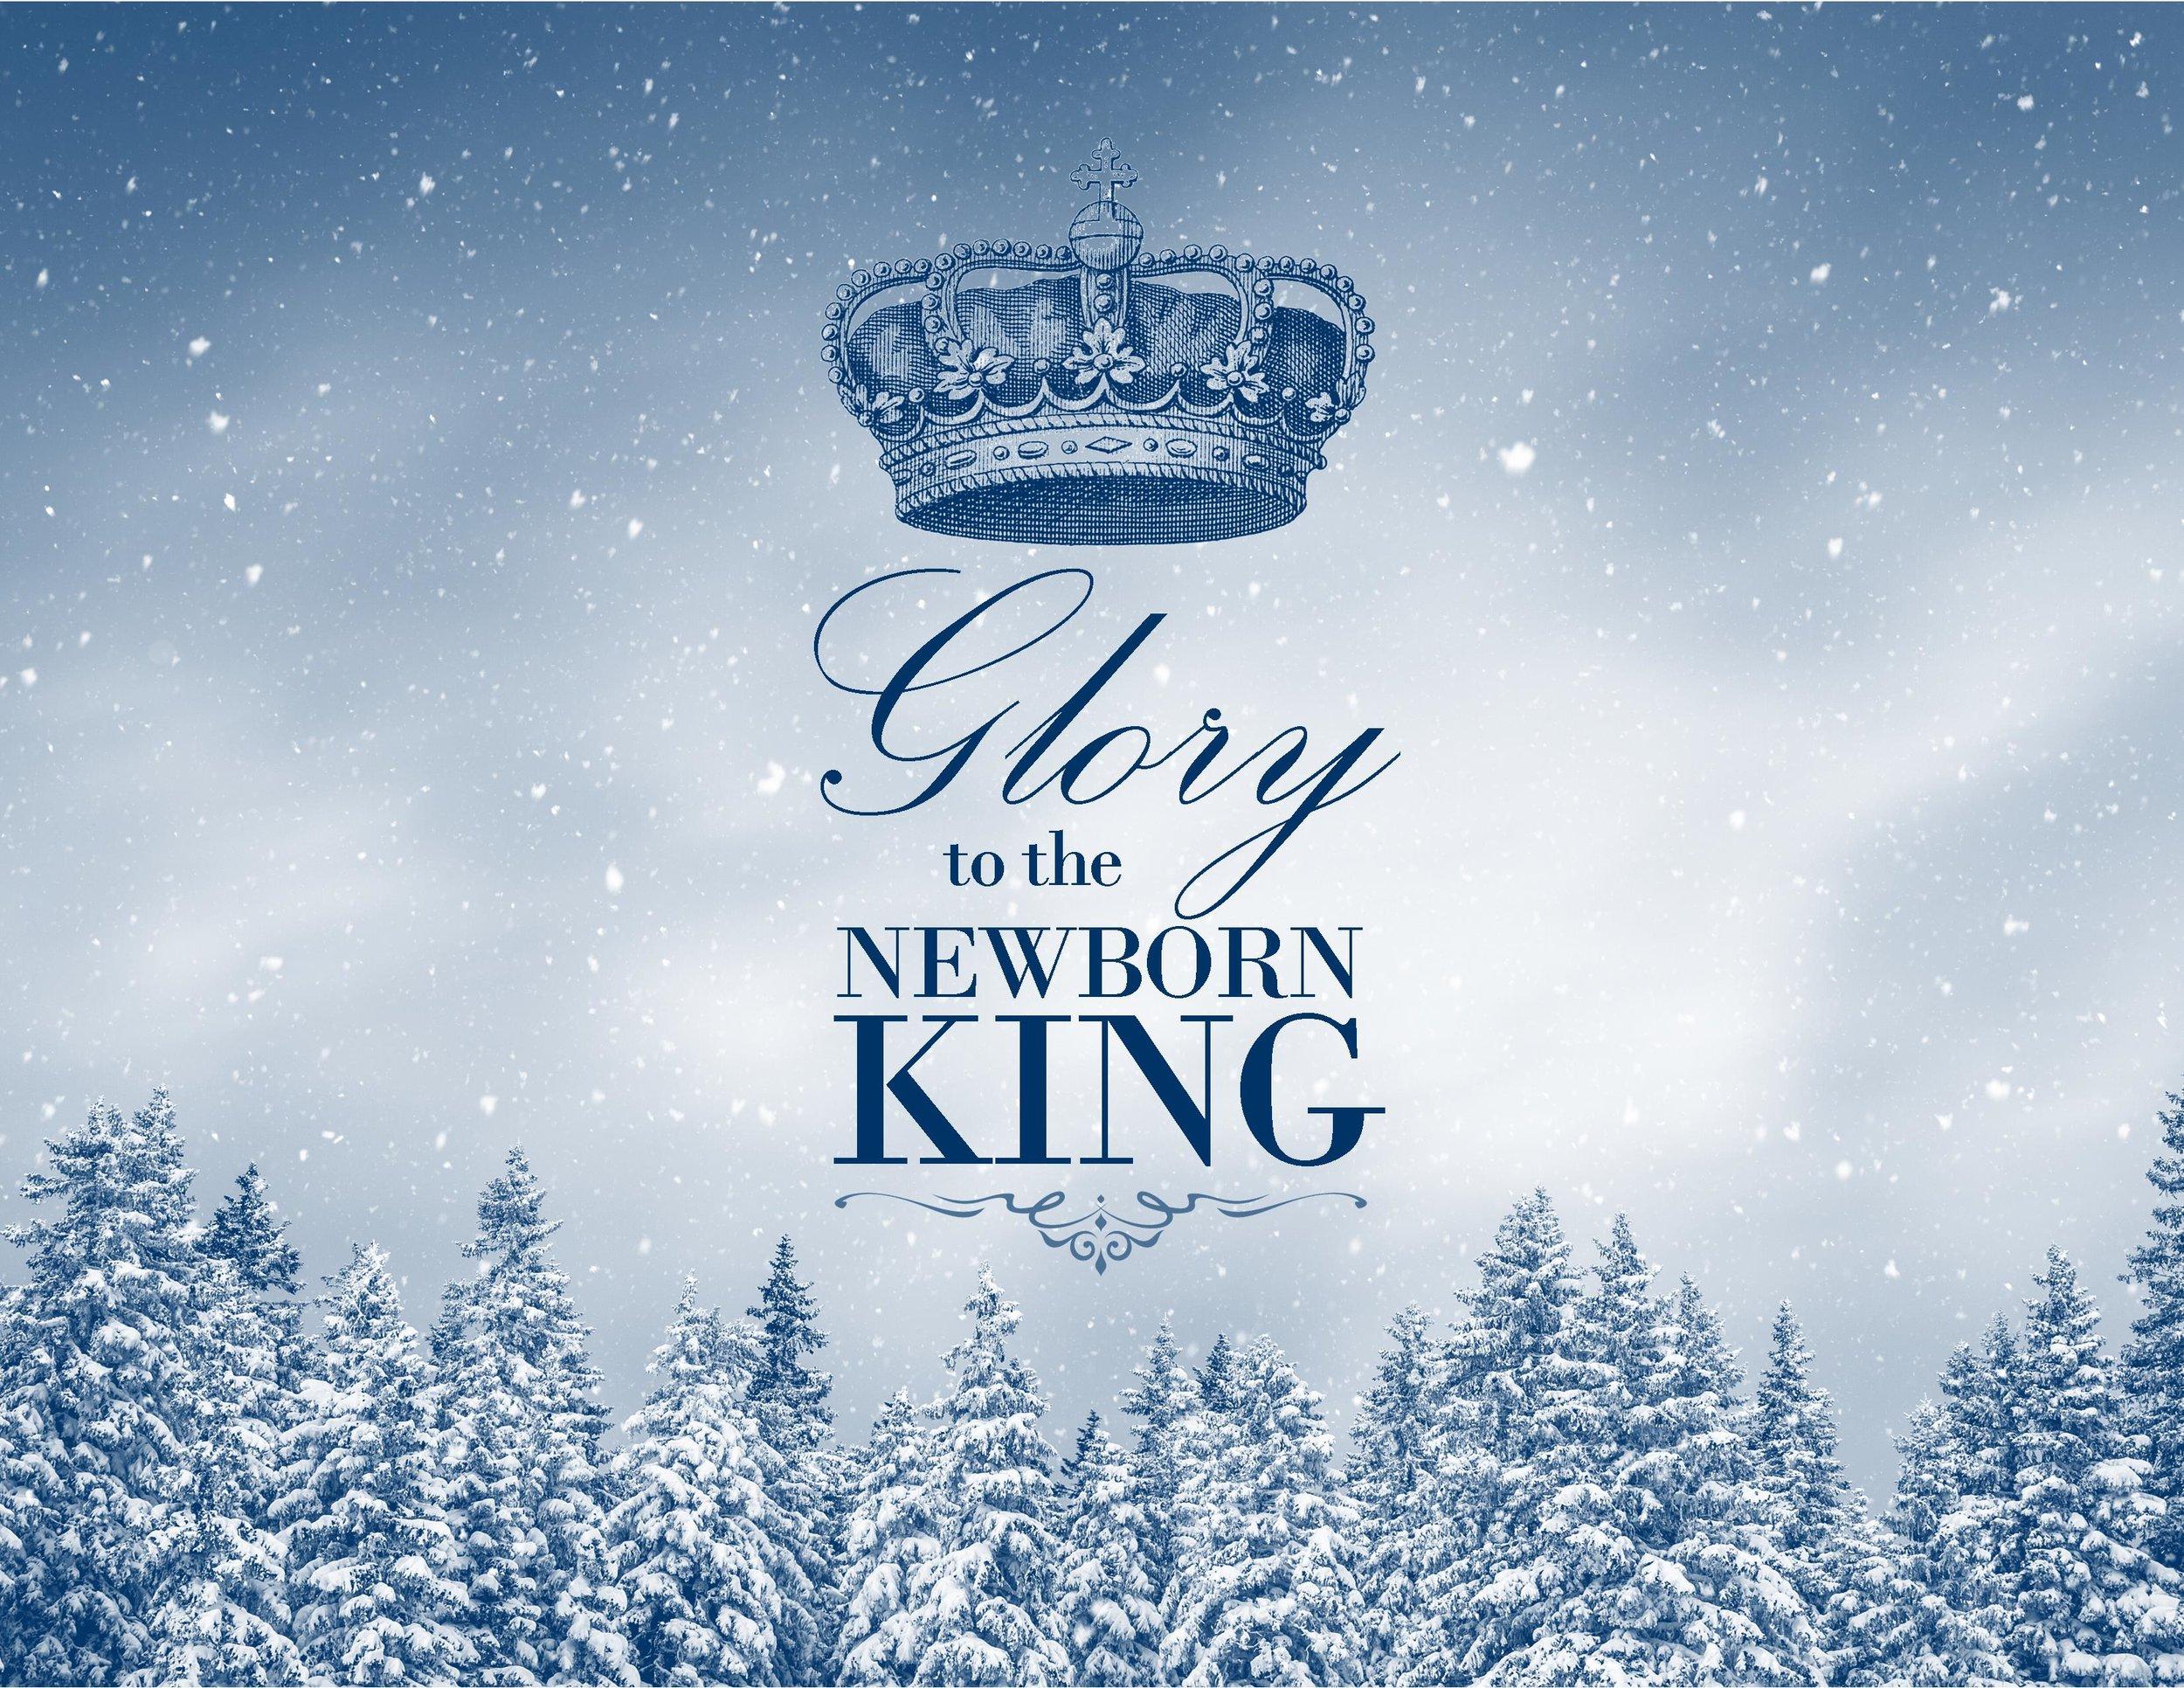 December 11, 2016 ~ The Line of the King (Matthew 1:1-17) ~ Pastor Jason Pilchard